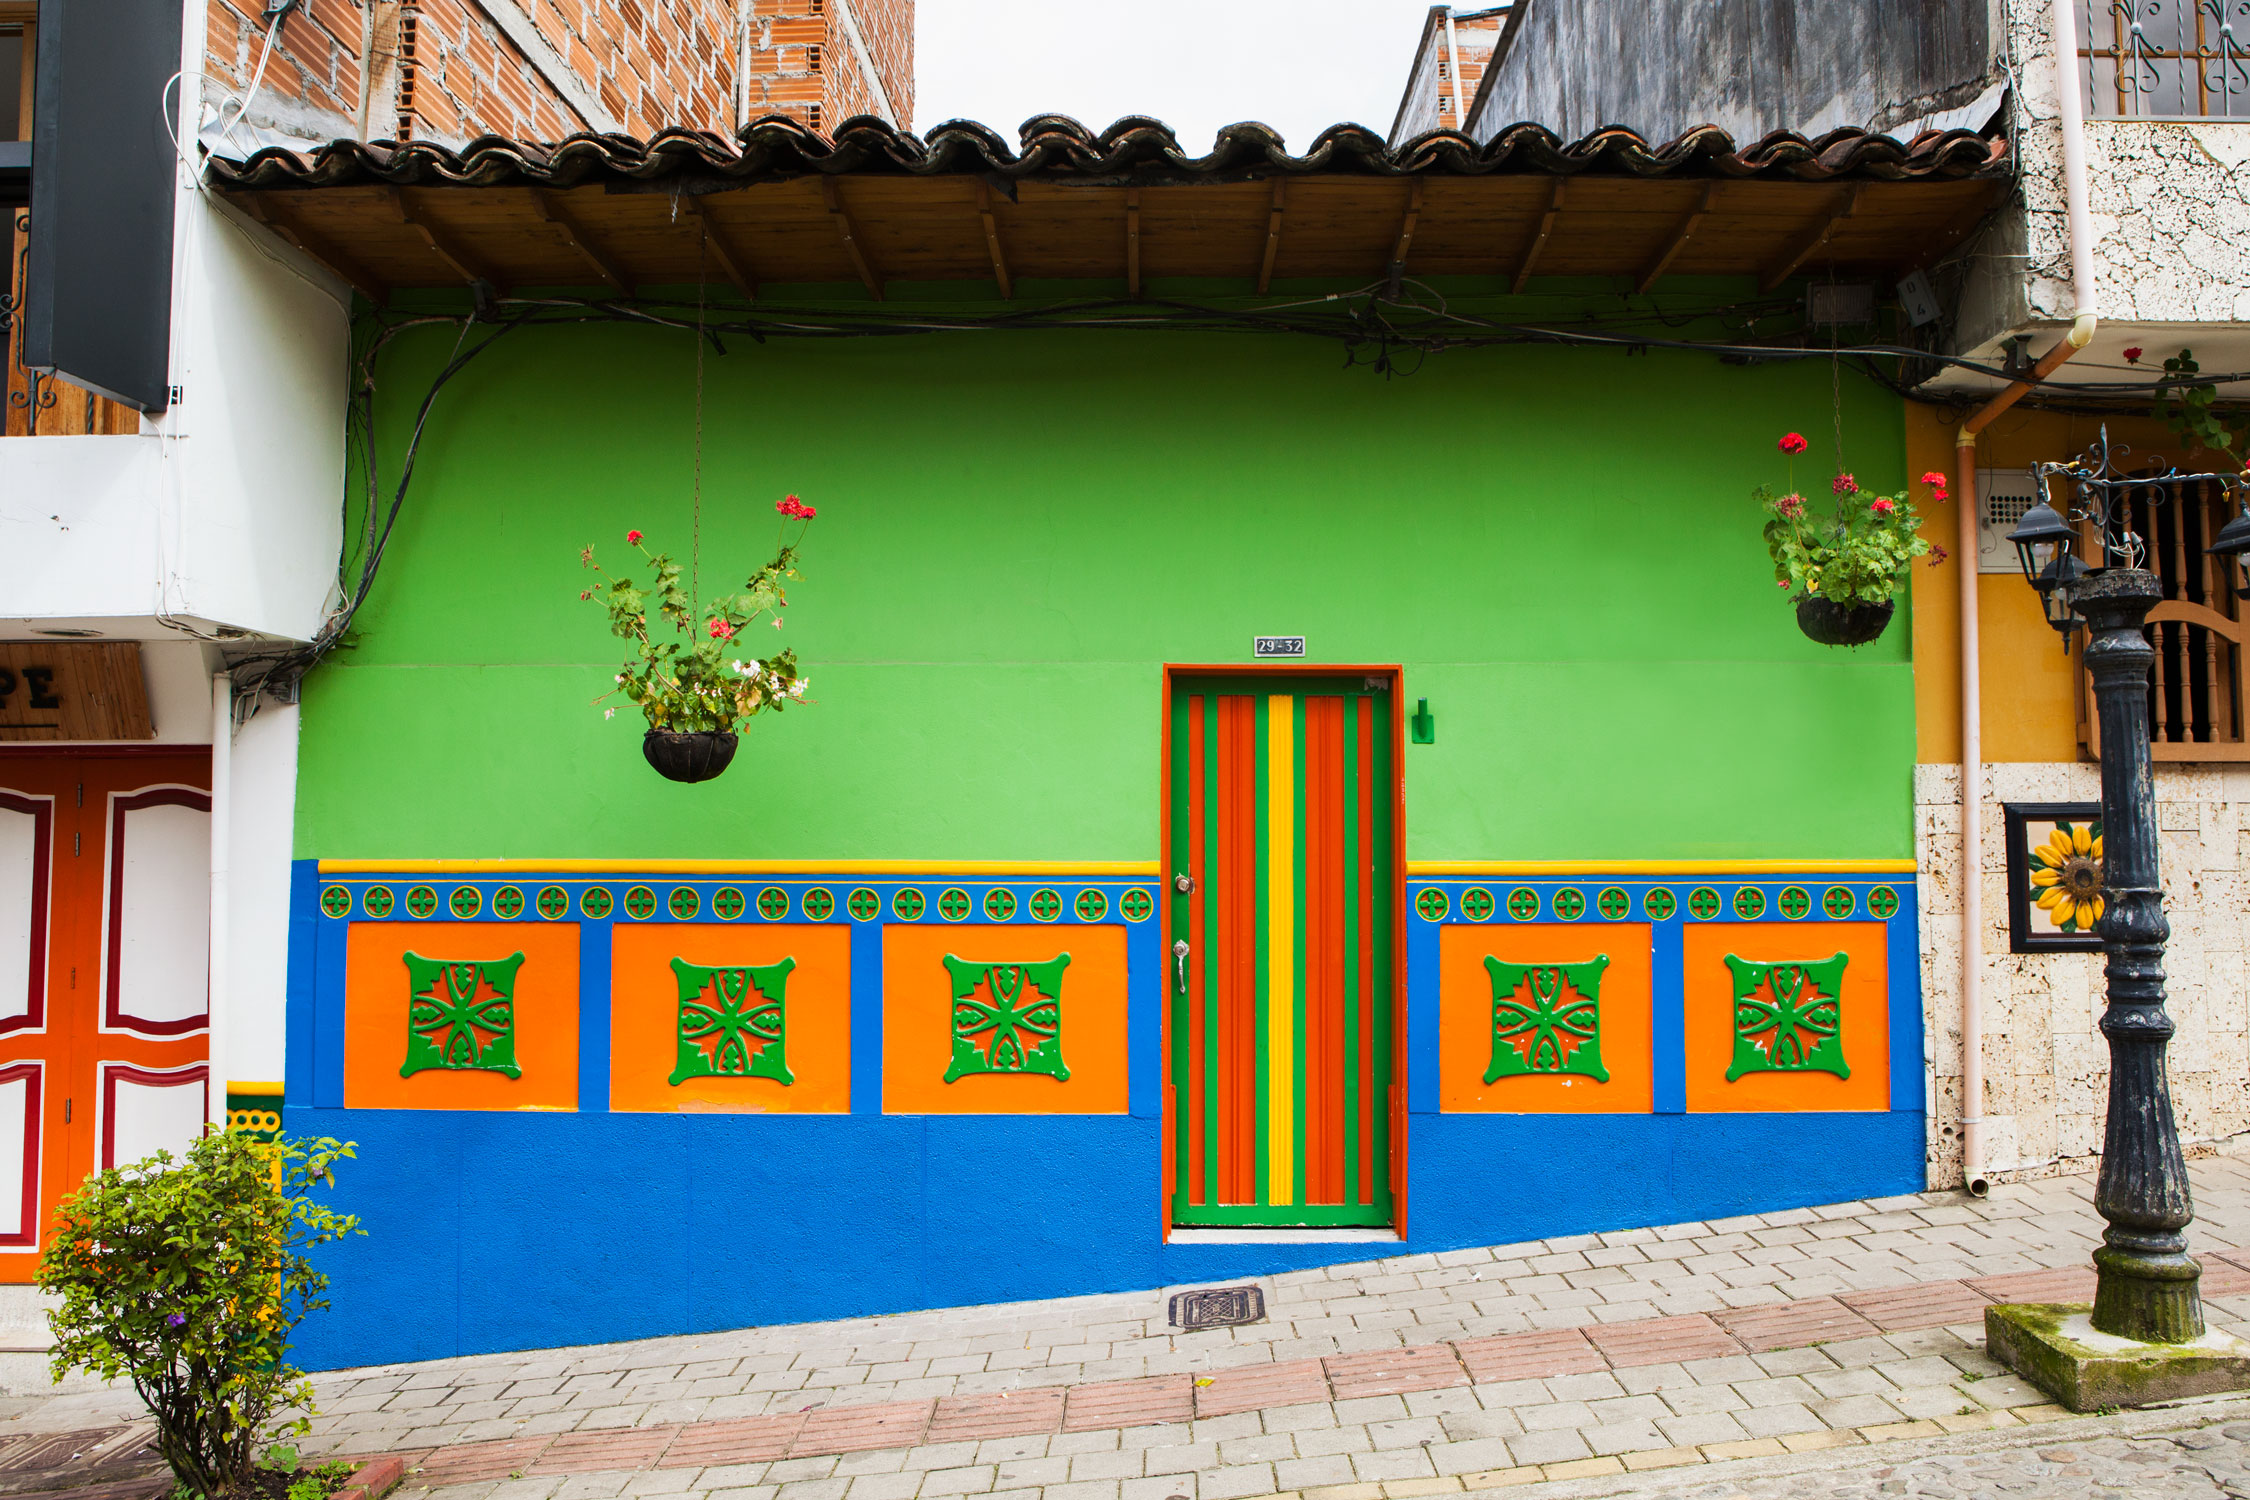 el-penol-guatape-colombia-wander-south-street-3.jpg